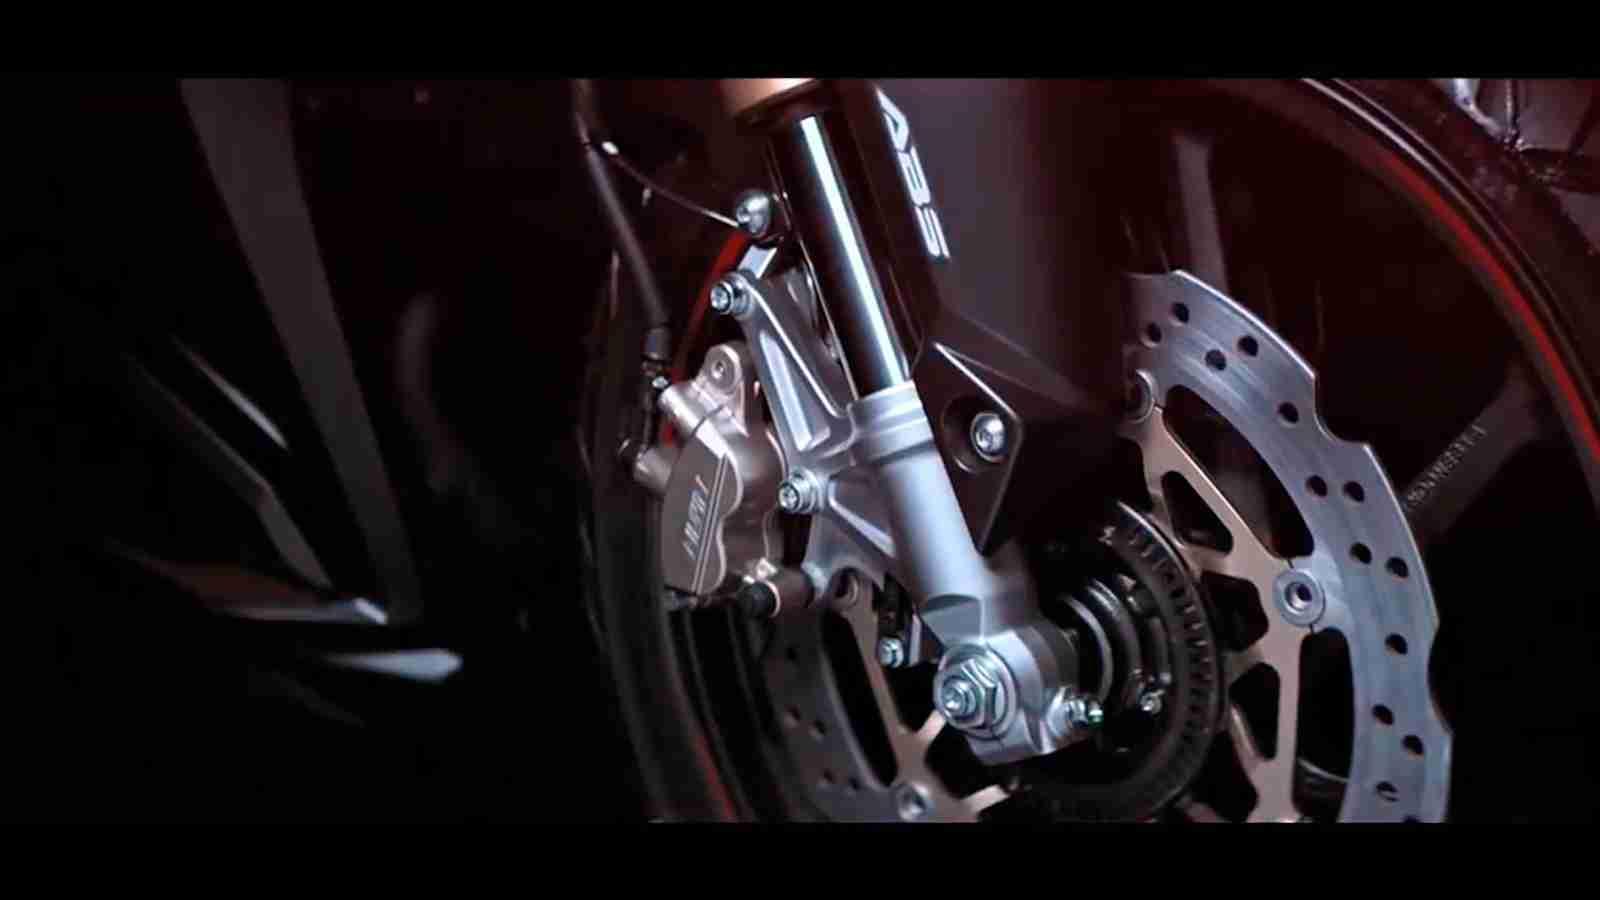 2017 Honda CBR 250RR front twin disc